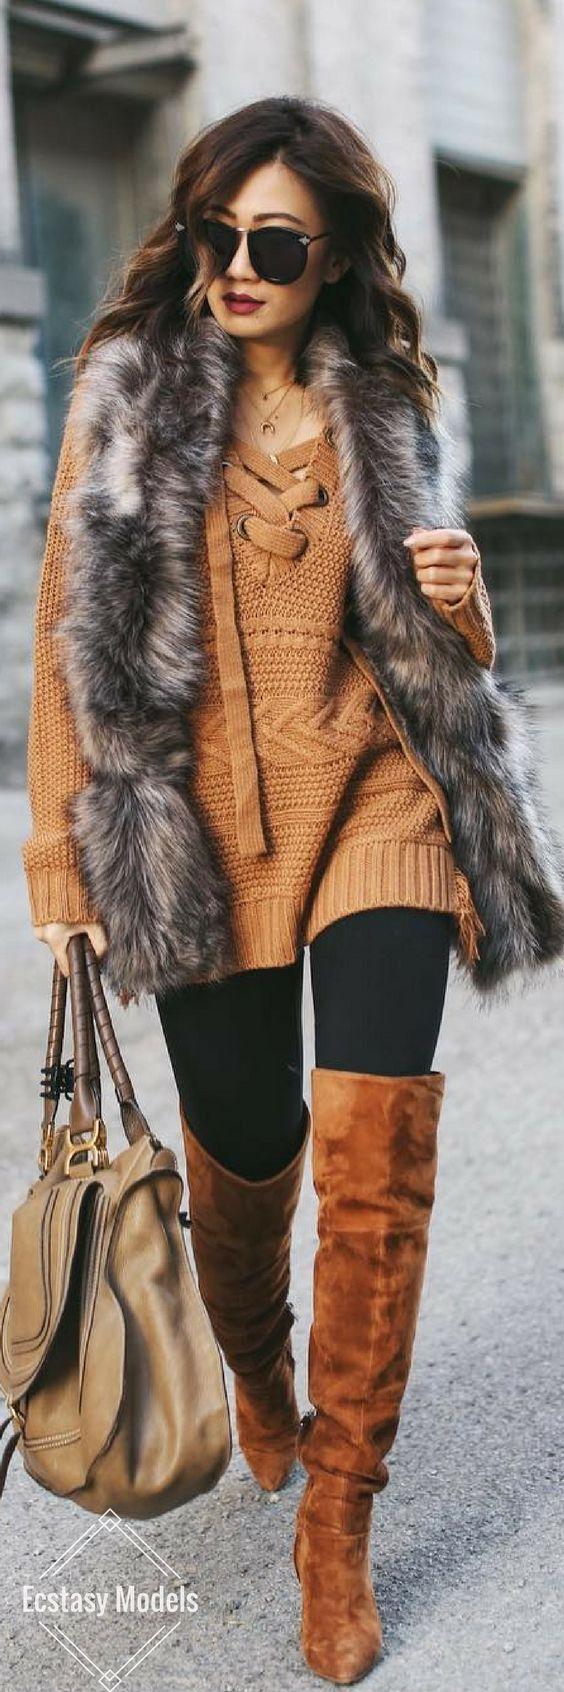 Camel OTK Boots // Fashion Look by Shai Chung